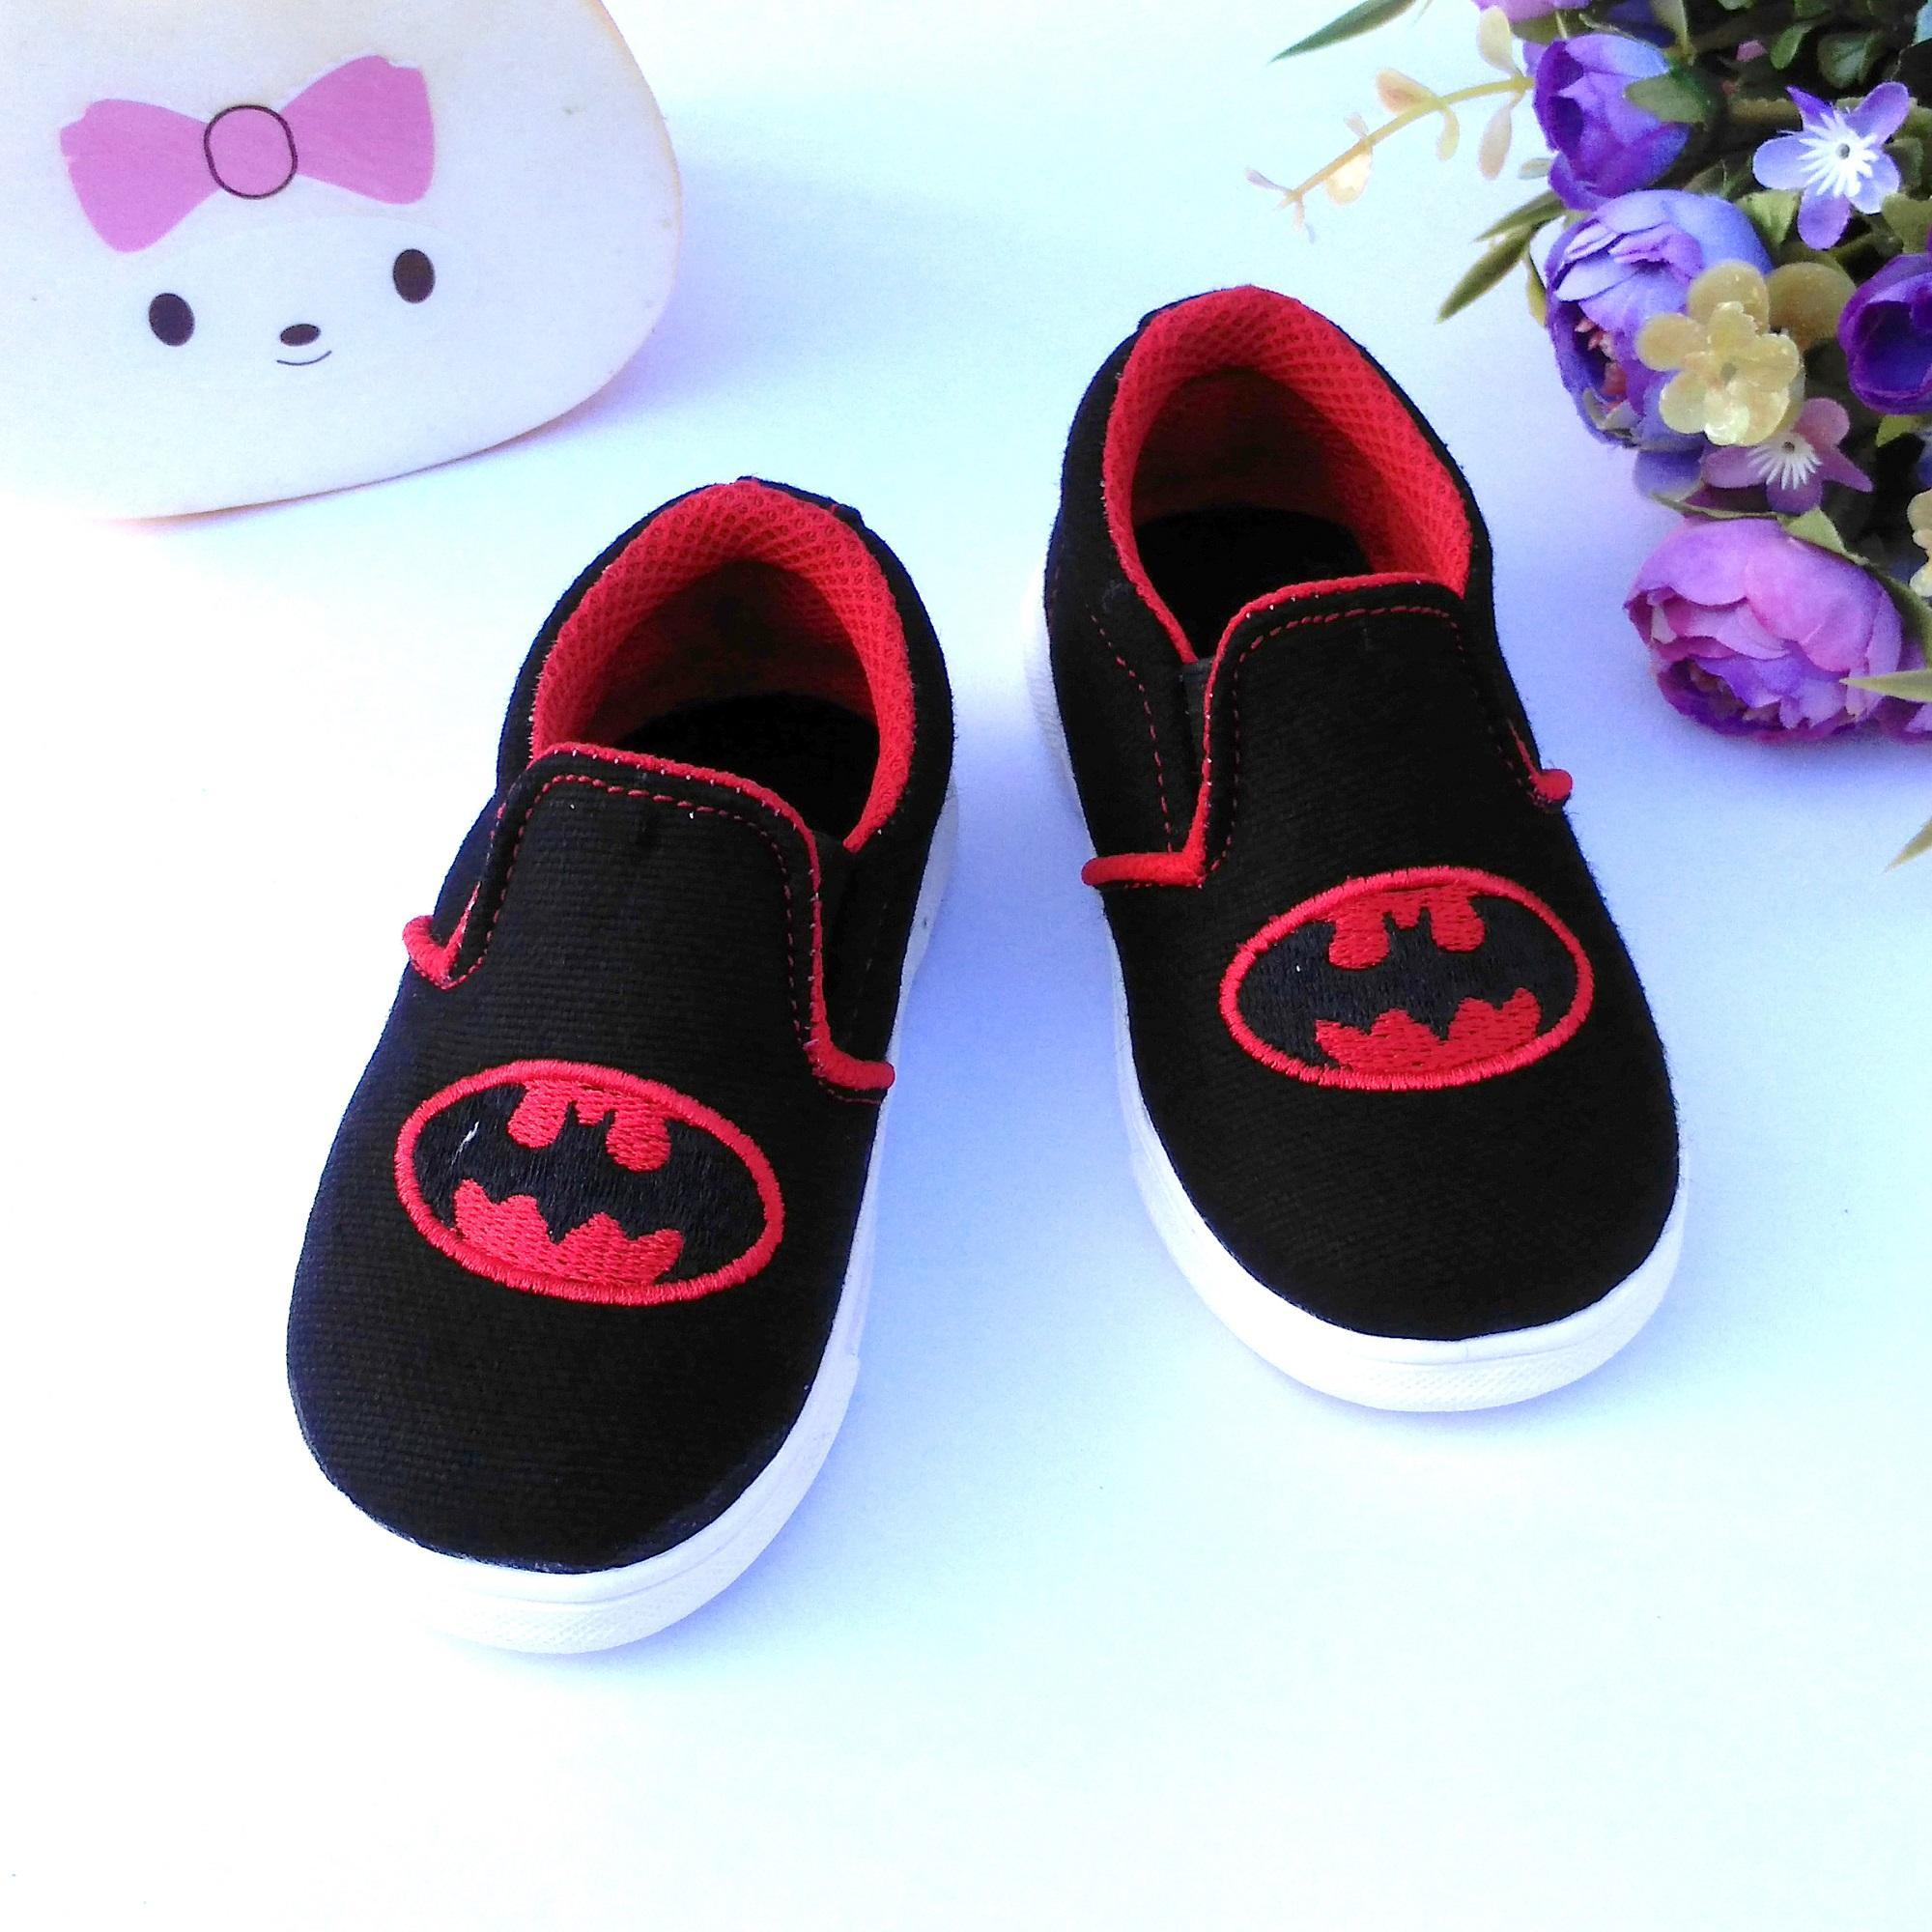 HQo Sepatu Anak Perempuan Slip On   Sepatu Anak Laki -Laki Casual   Sepatu  Bayi ecb88cf363